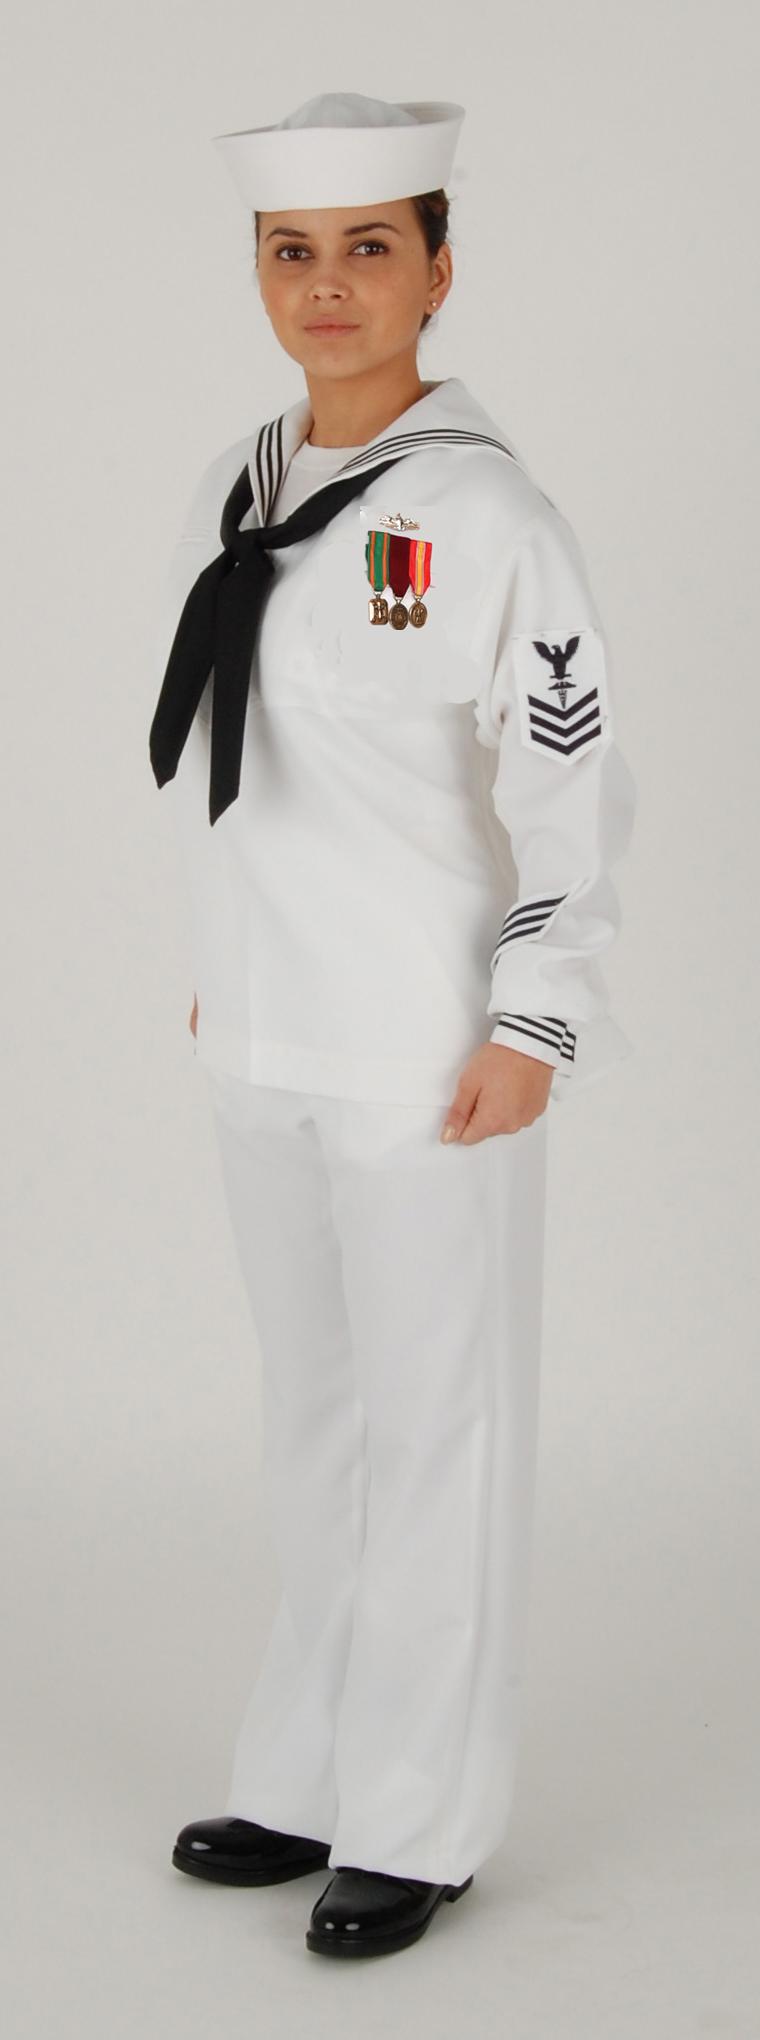 new navy enlisted service white dress uniform - Google